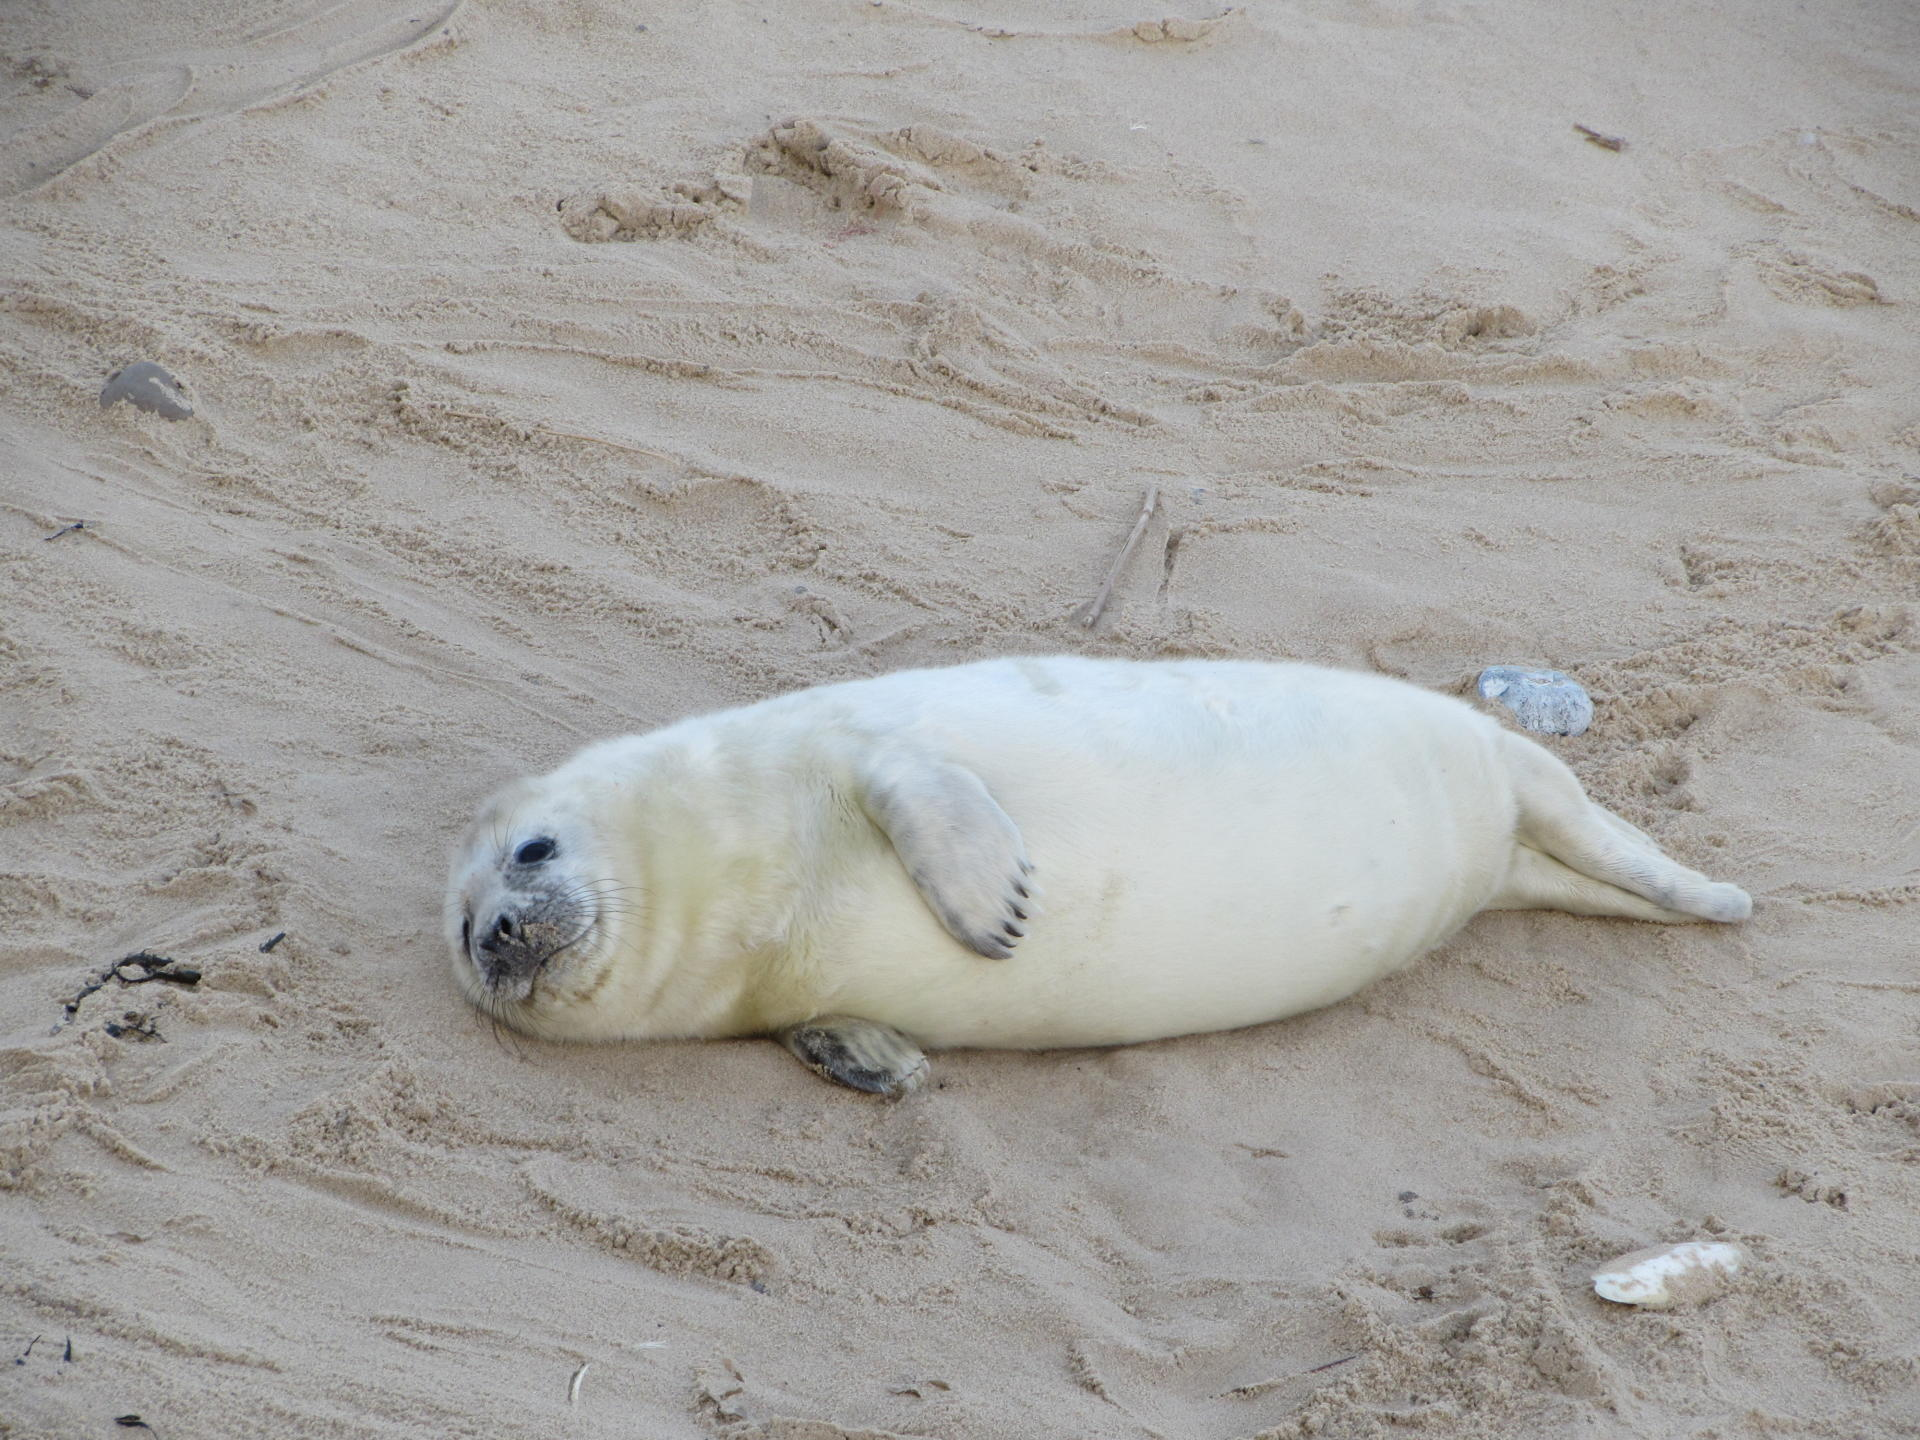 Seal Watching in North Norfolk - Yesihaveablog | Seals Norfolk Horsey Gap | Seal Colony | Norfolk - Life in a Fine City | Winterlust